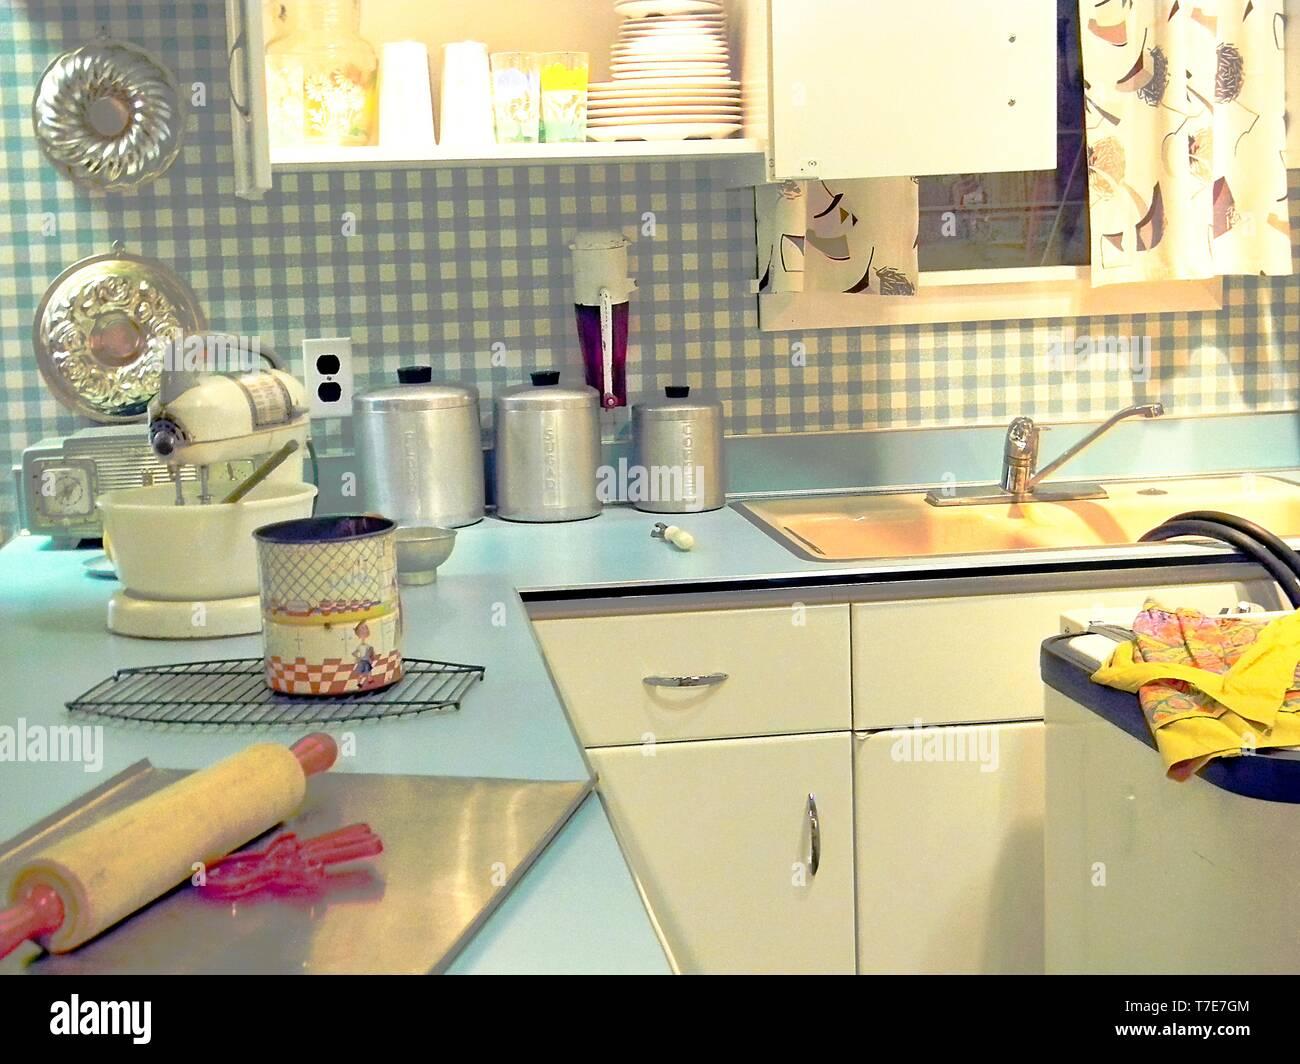 https www alamy com turquoise retro kitchen with baking tools image245561028 html